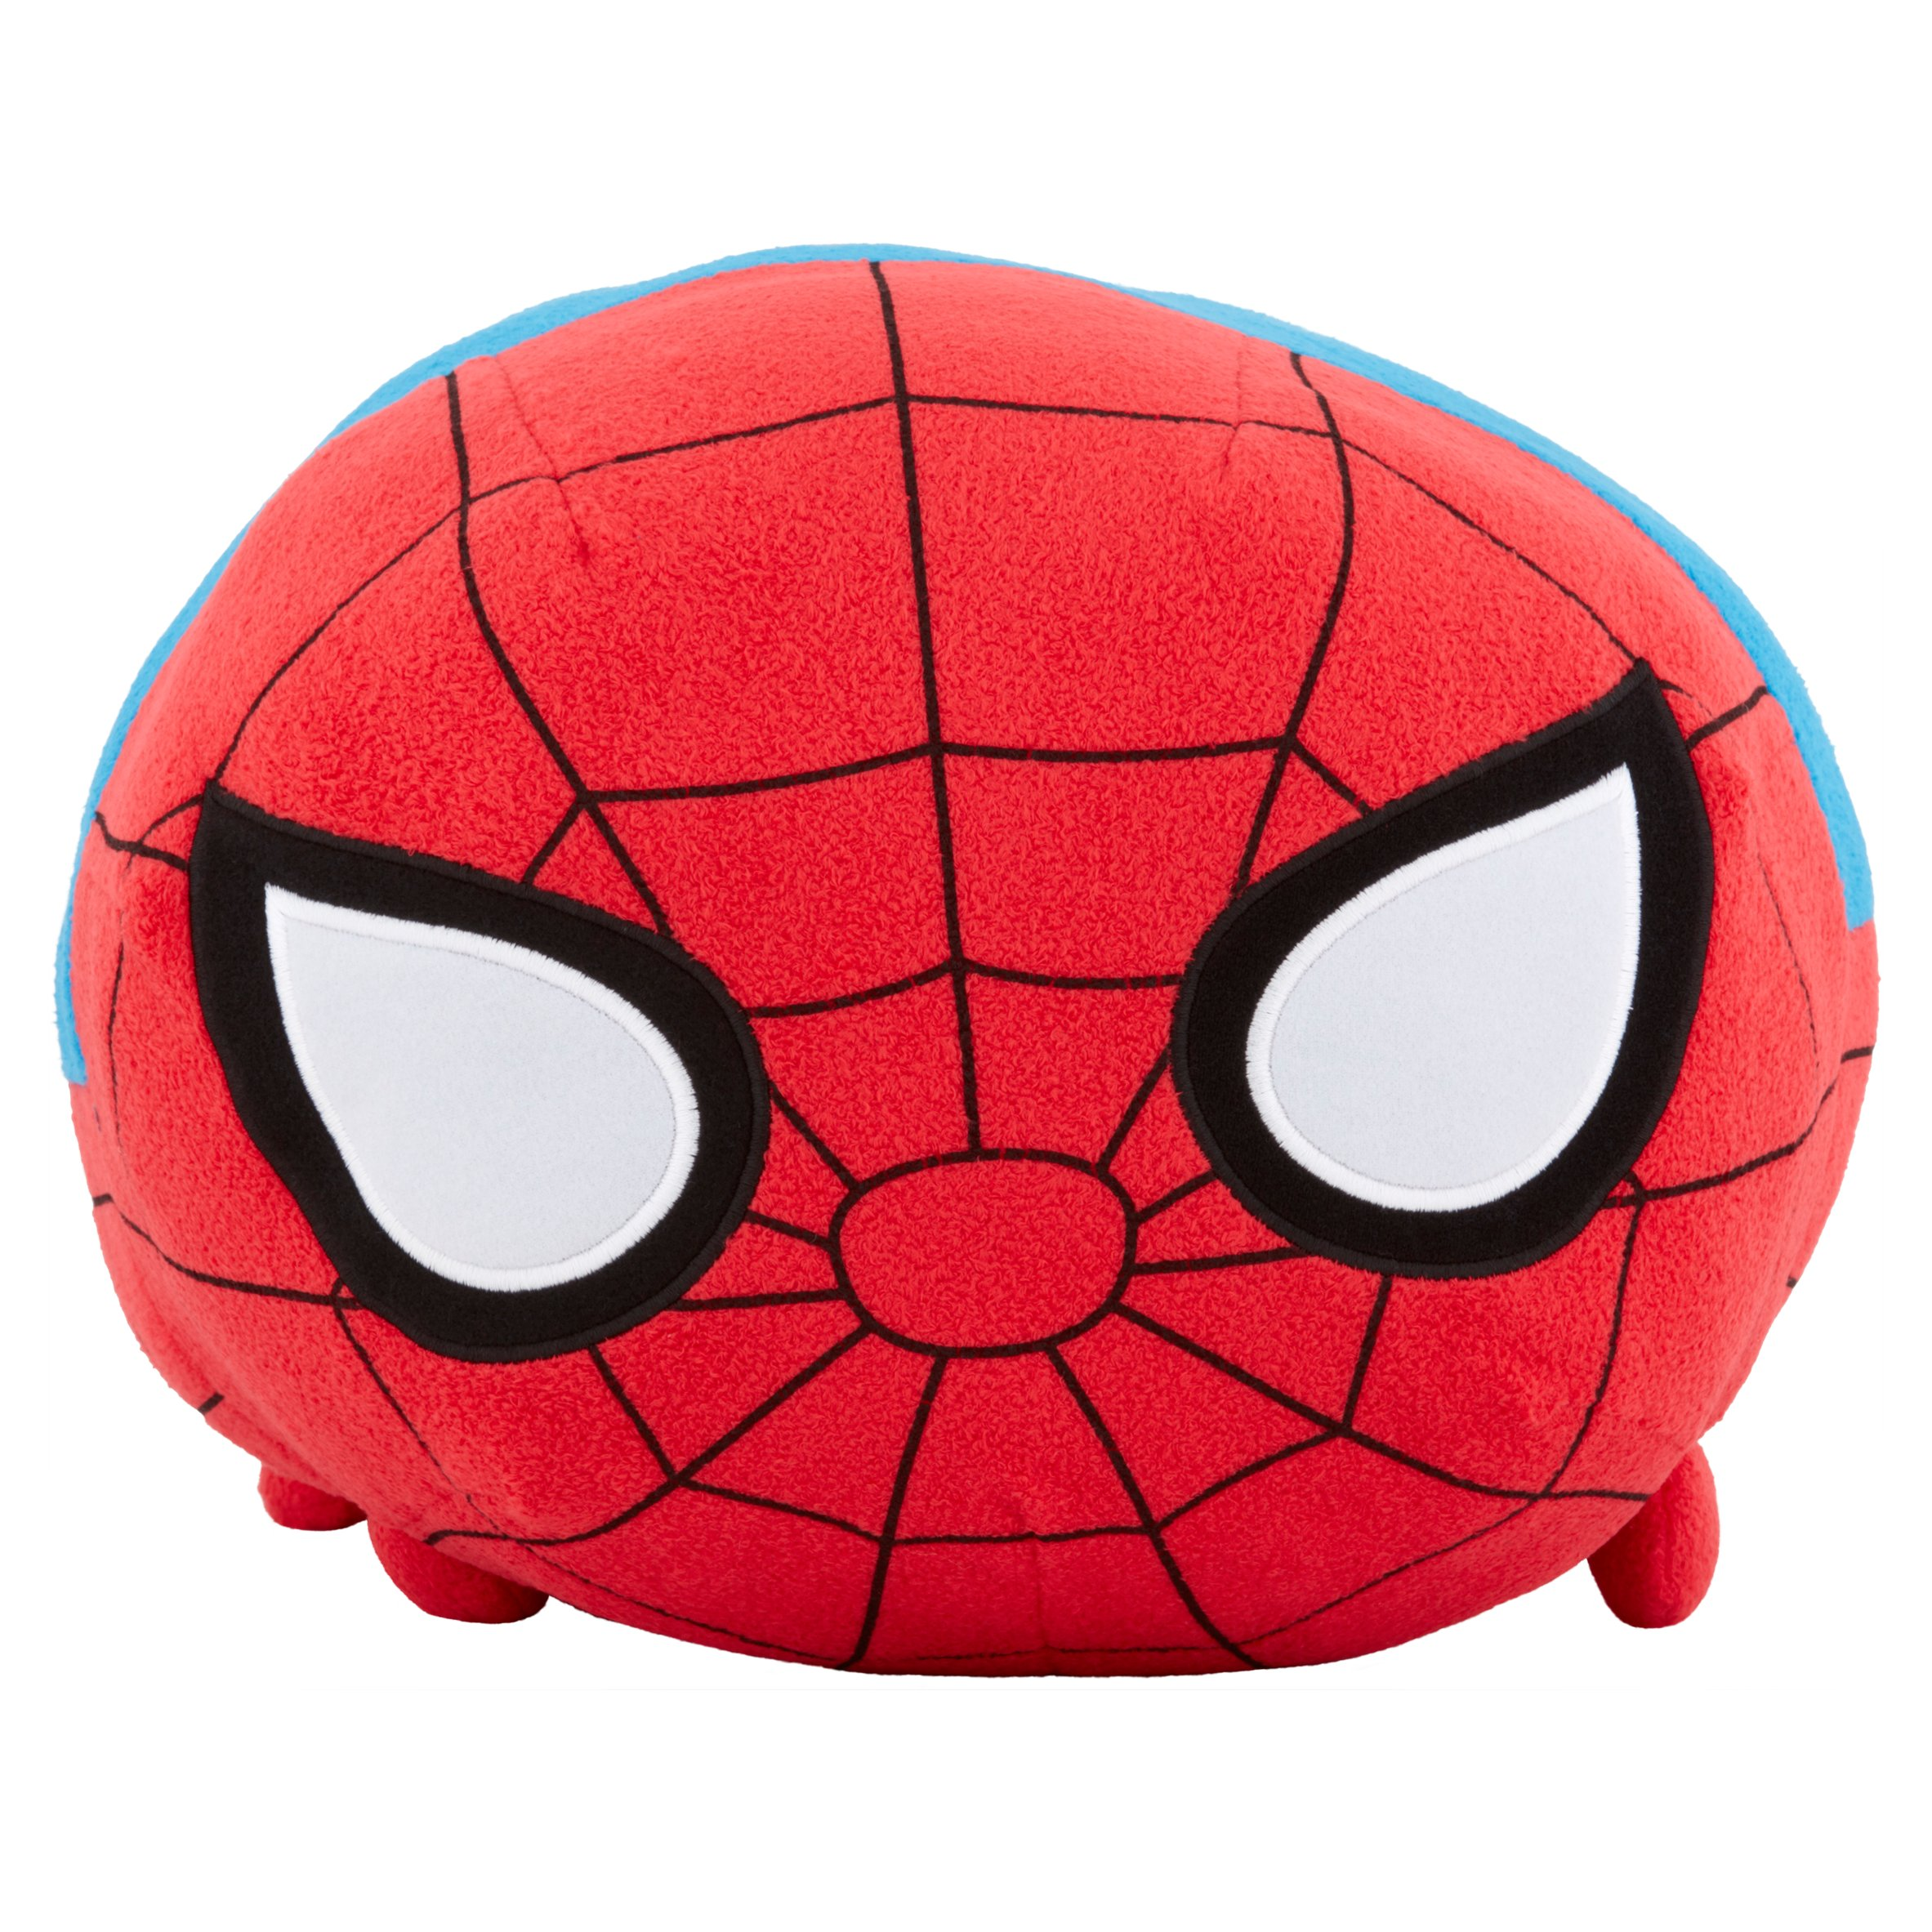 Peluches Para Niños, Niñas Y Adultos Disney Marvel Spider-Man Tsum Tsum Plush Doll + Disney en VeoyCompro.net